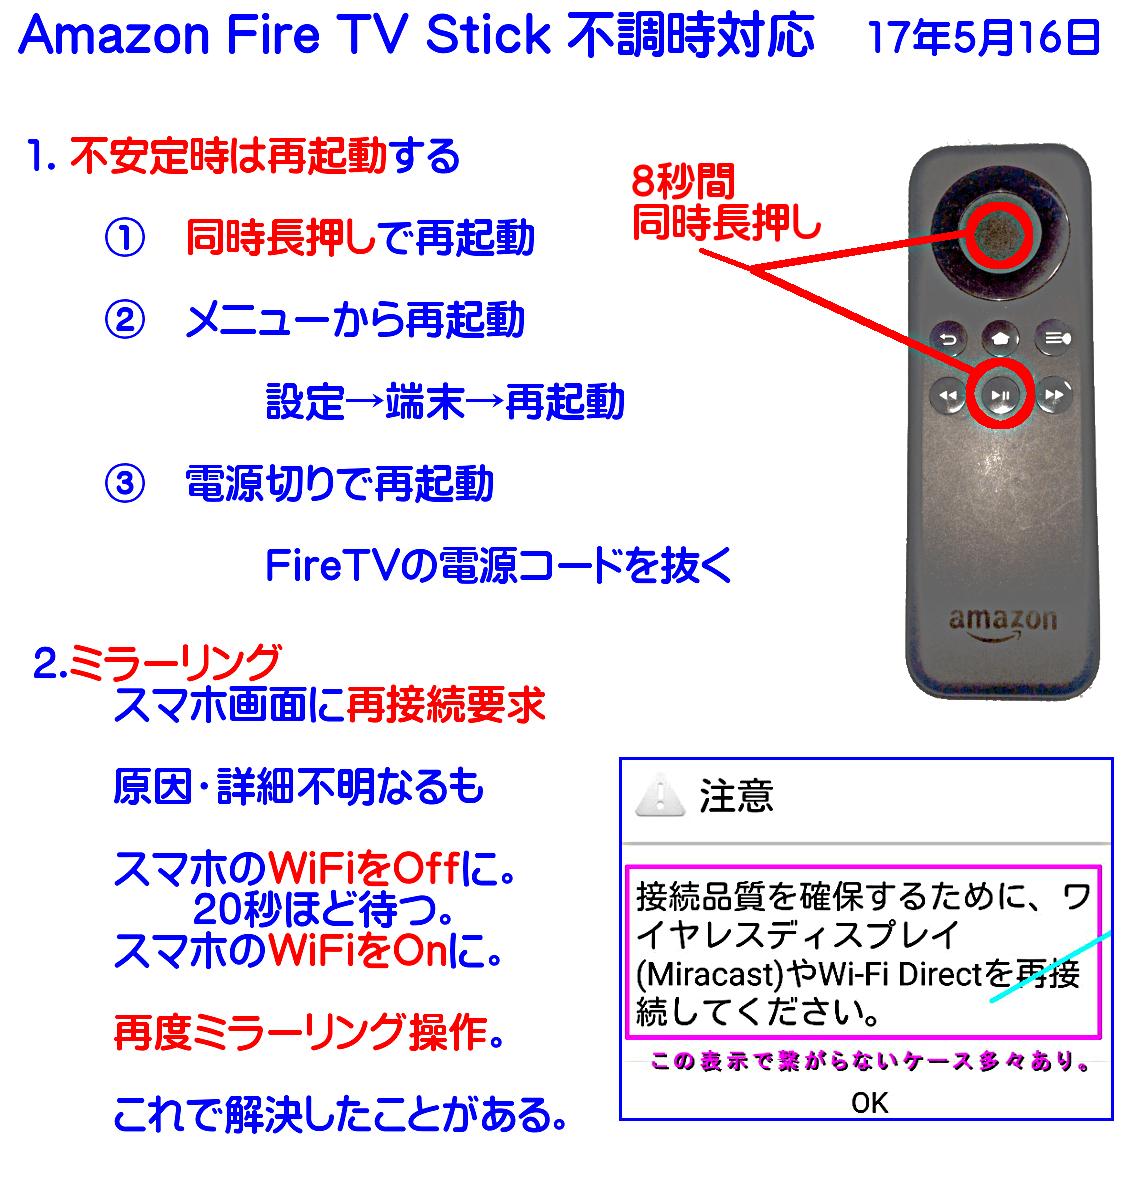 Stick fire ミラーリング tv